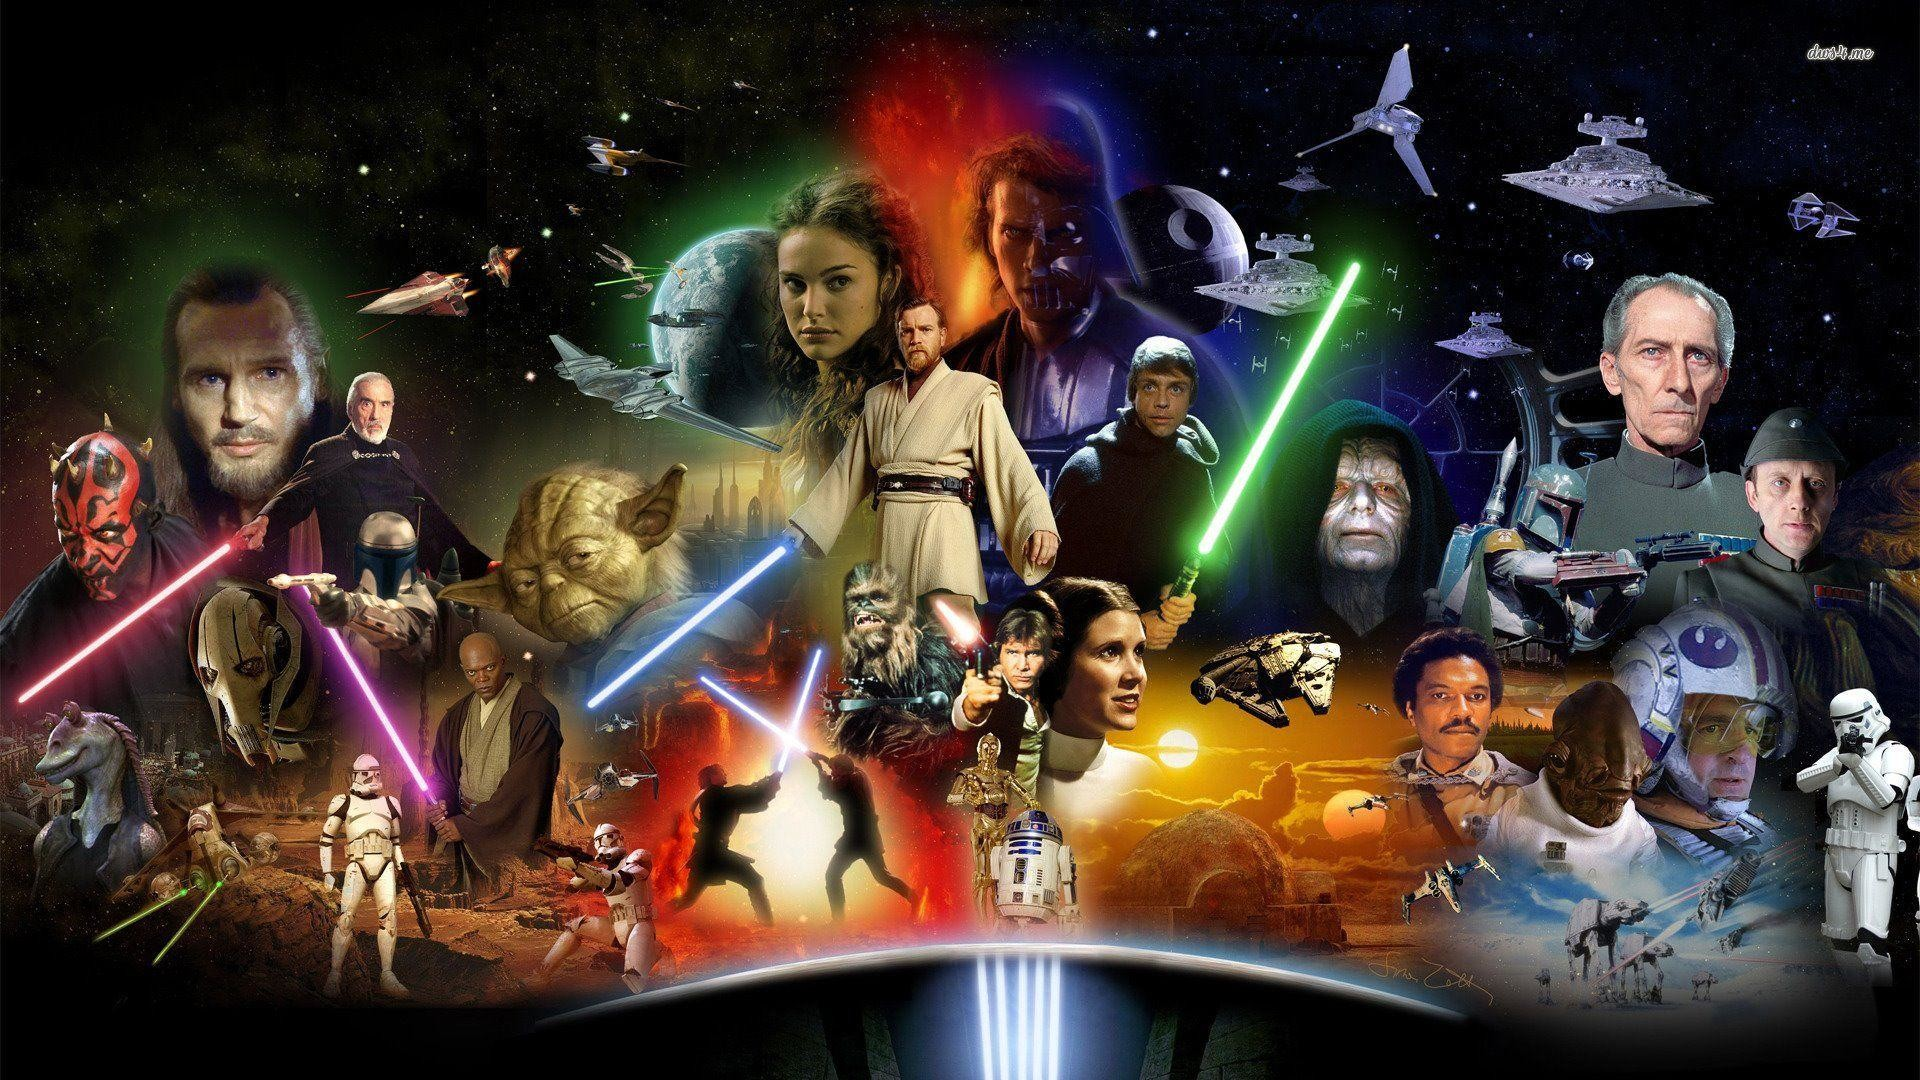 Star Wars Movie Wallpaper 65 Pictures